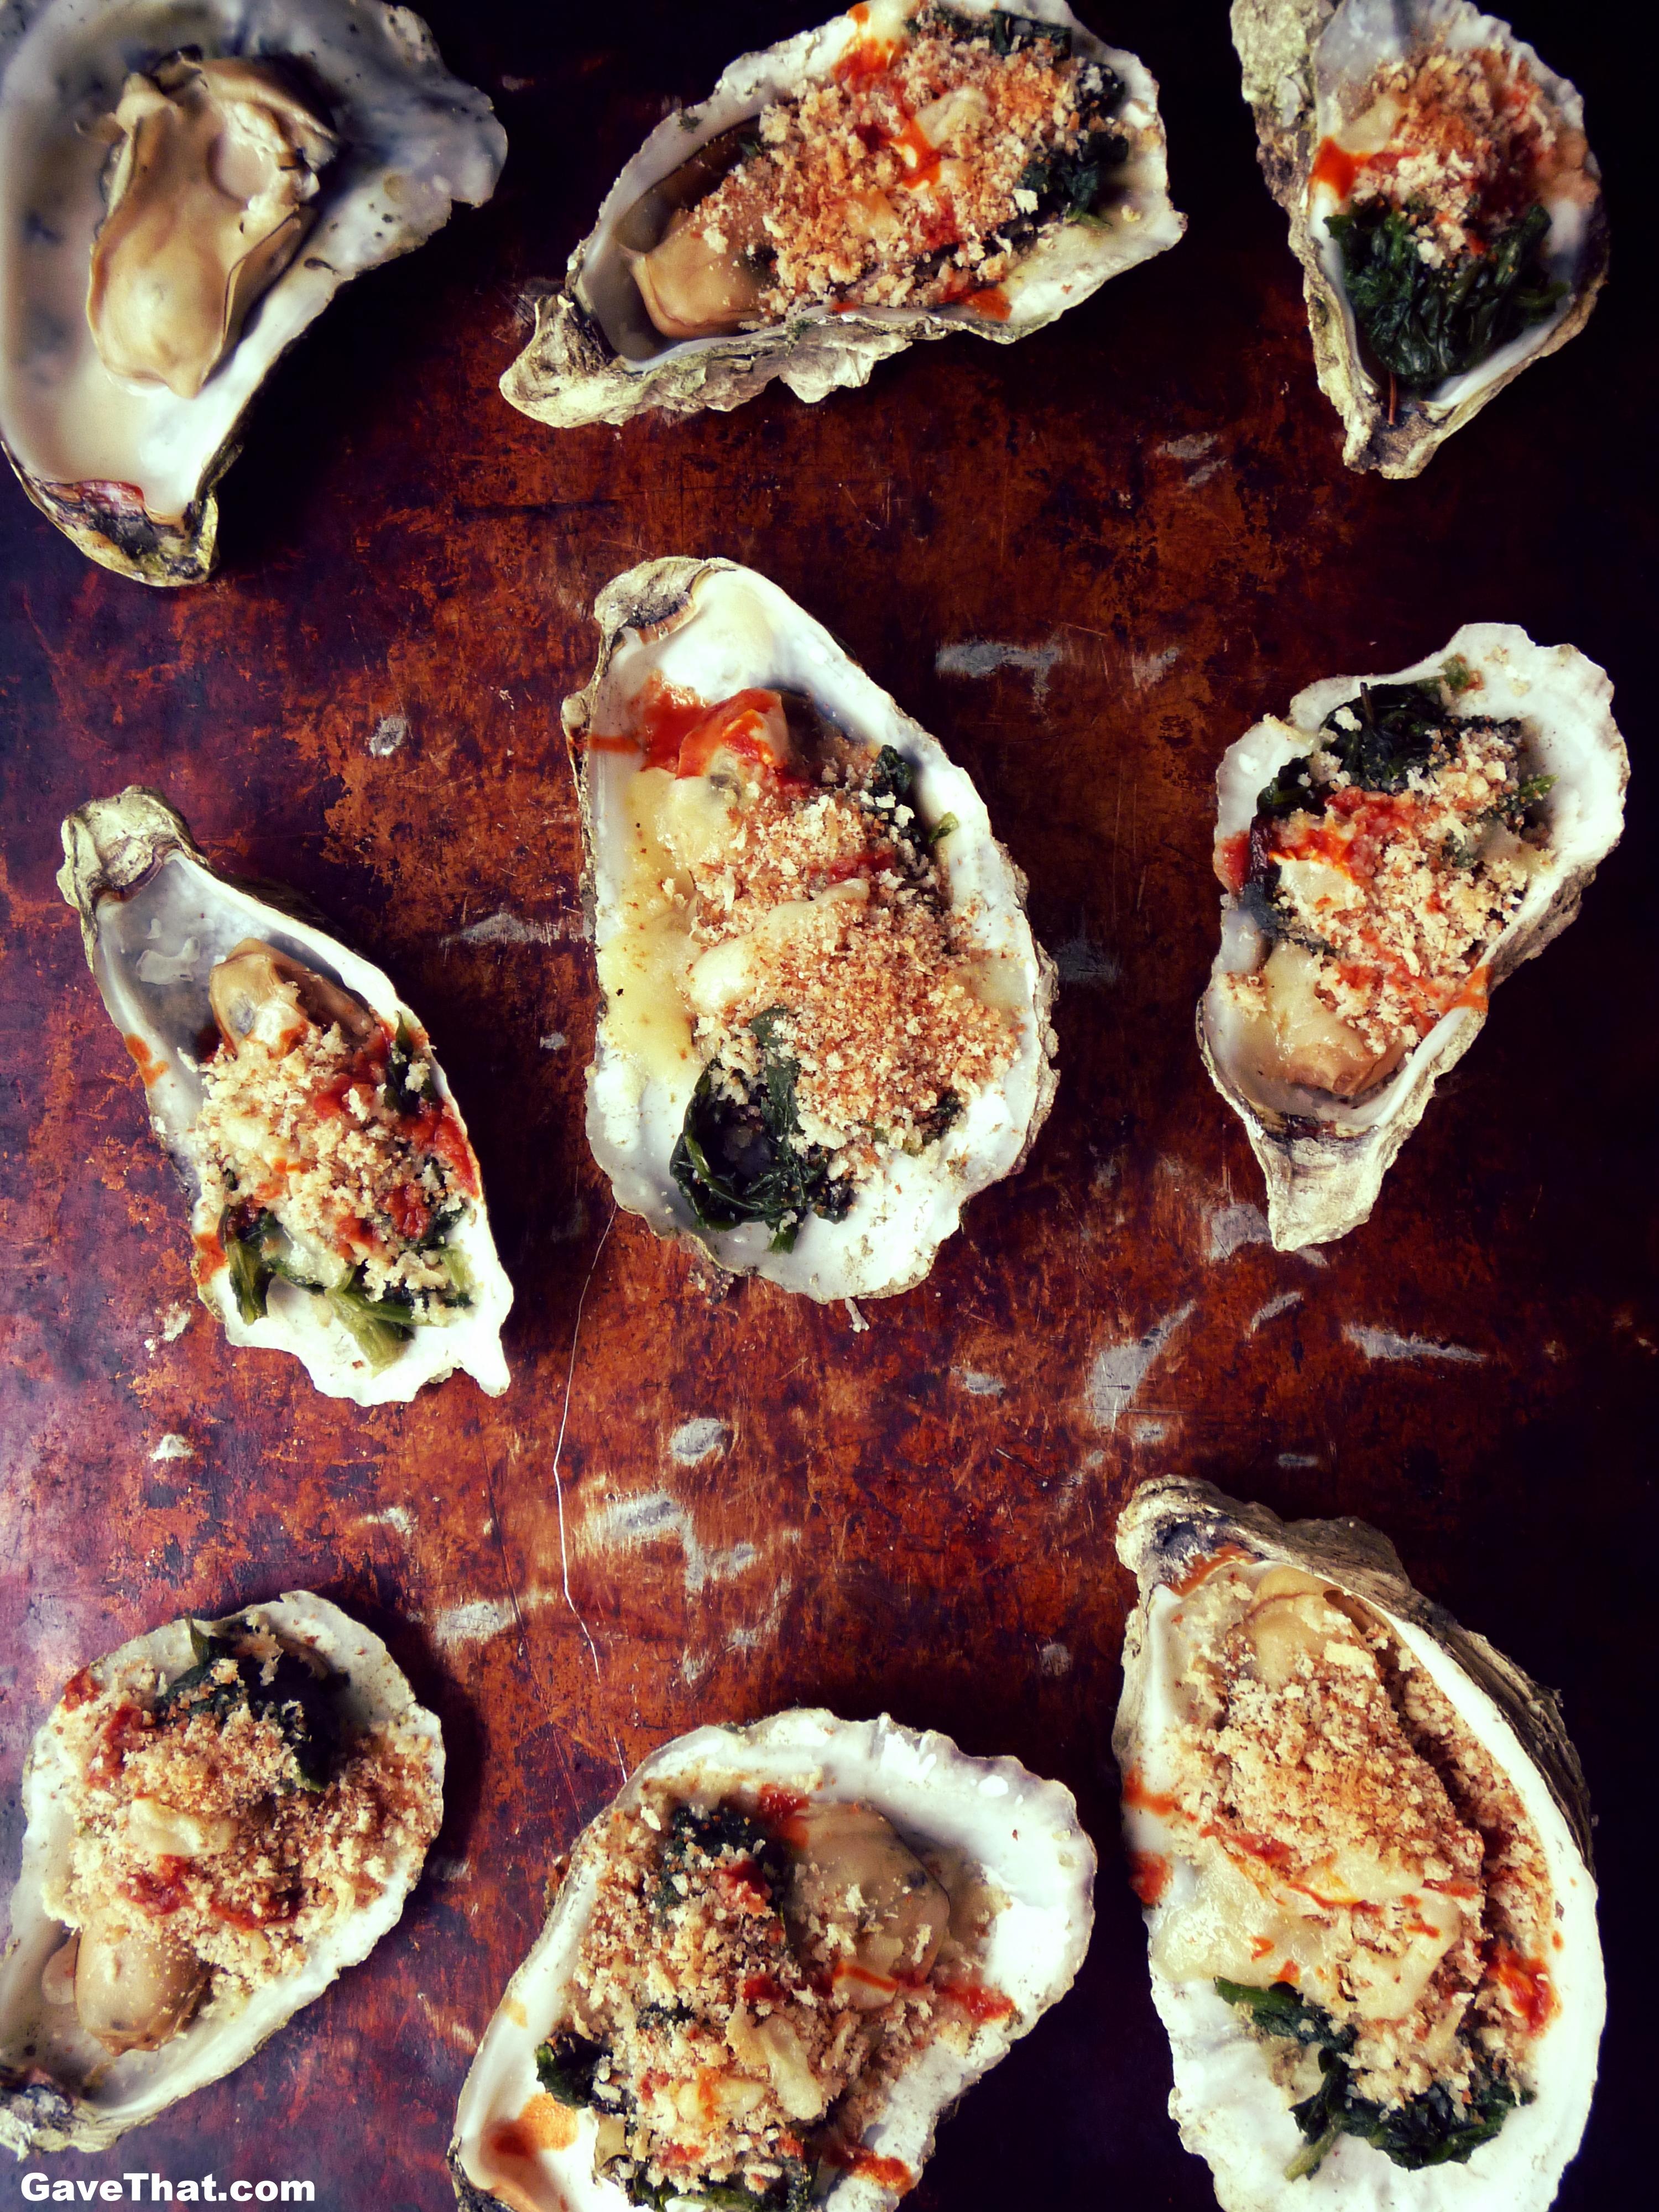 A platter of Oysters Rockefeller